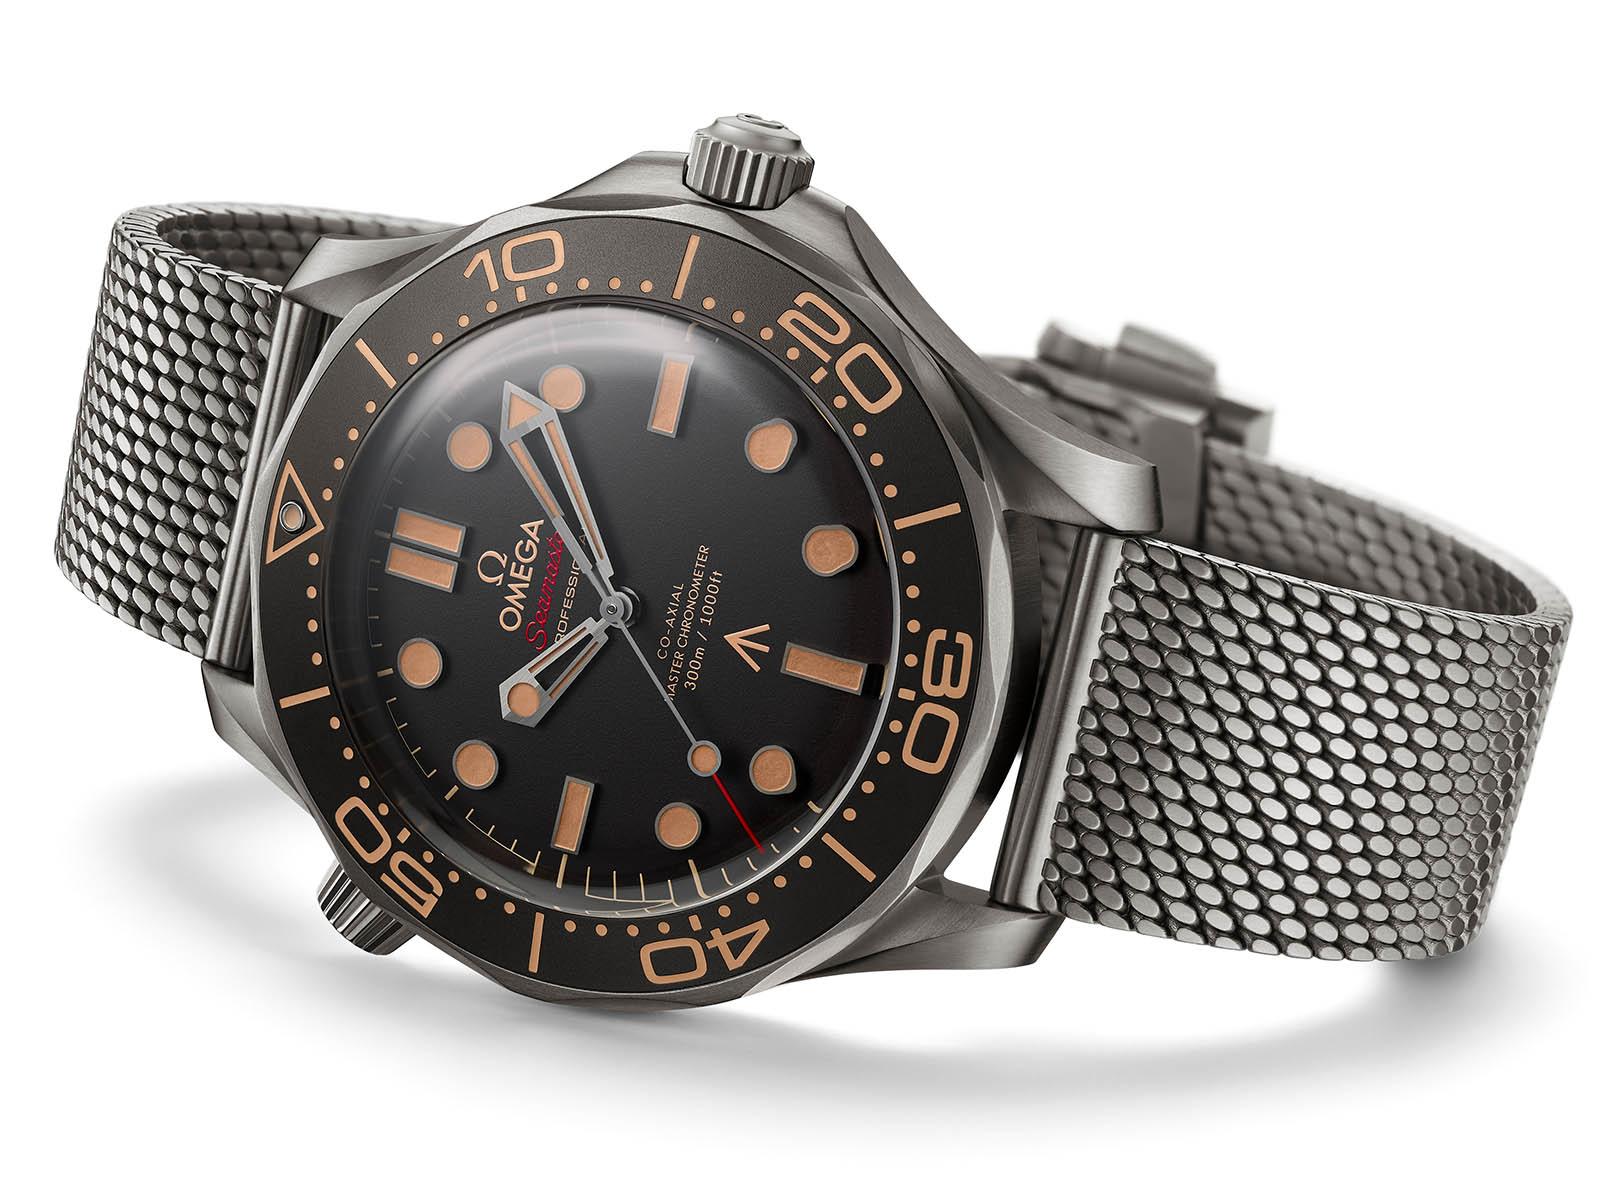 210-90-42-20-01-001-omega-seamaster-diver-300m-007-edition-3.jpg